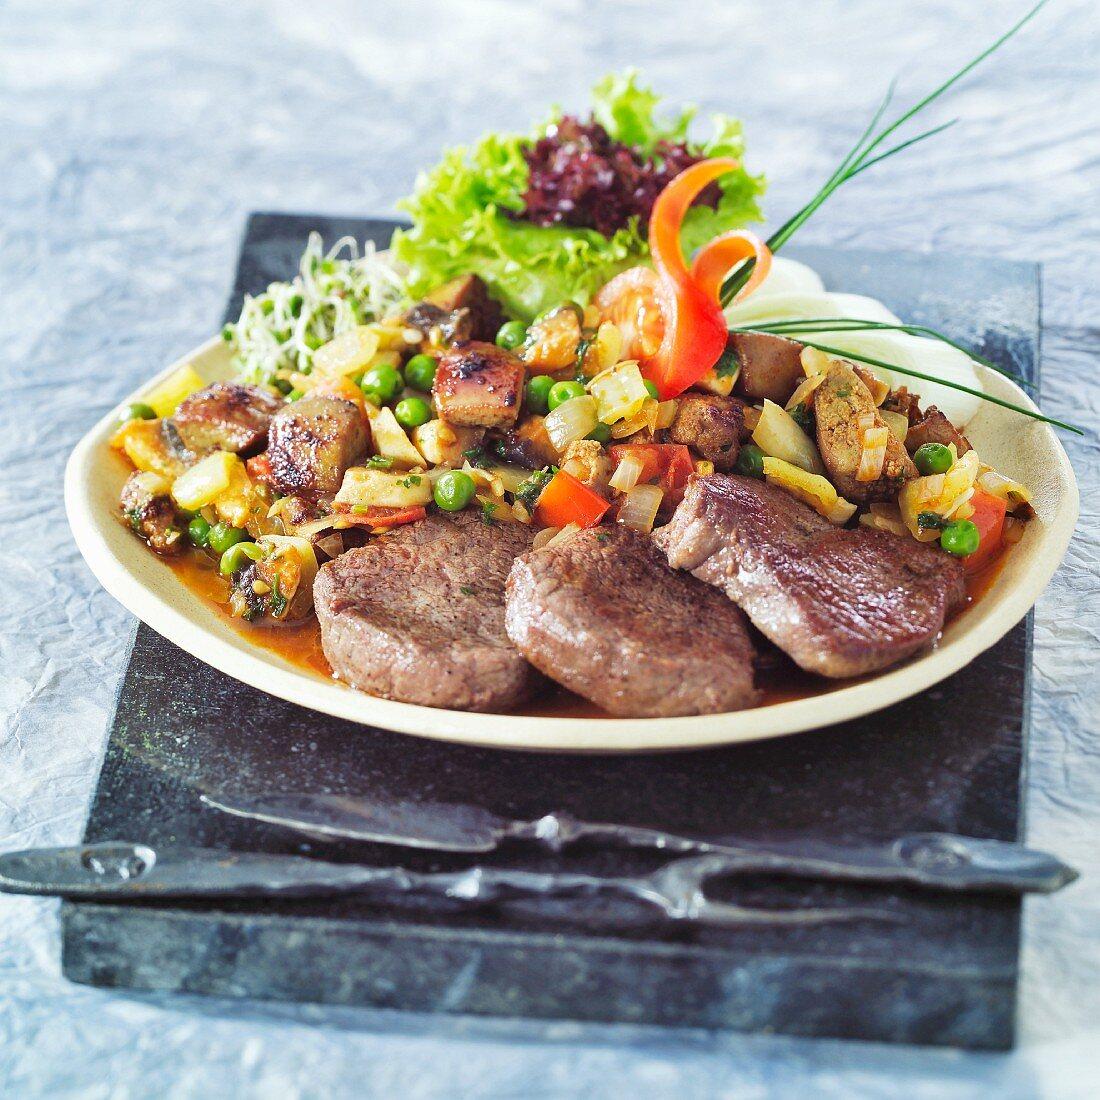 Budapest-style beef sirloin